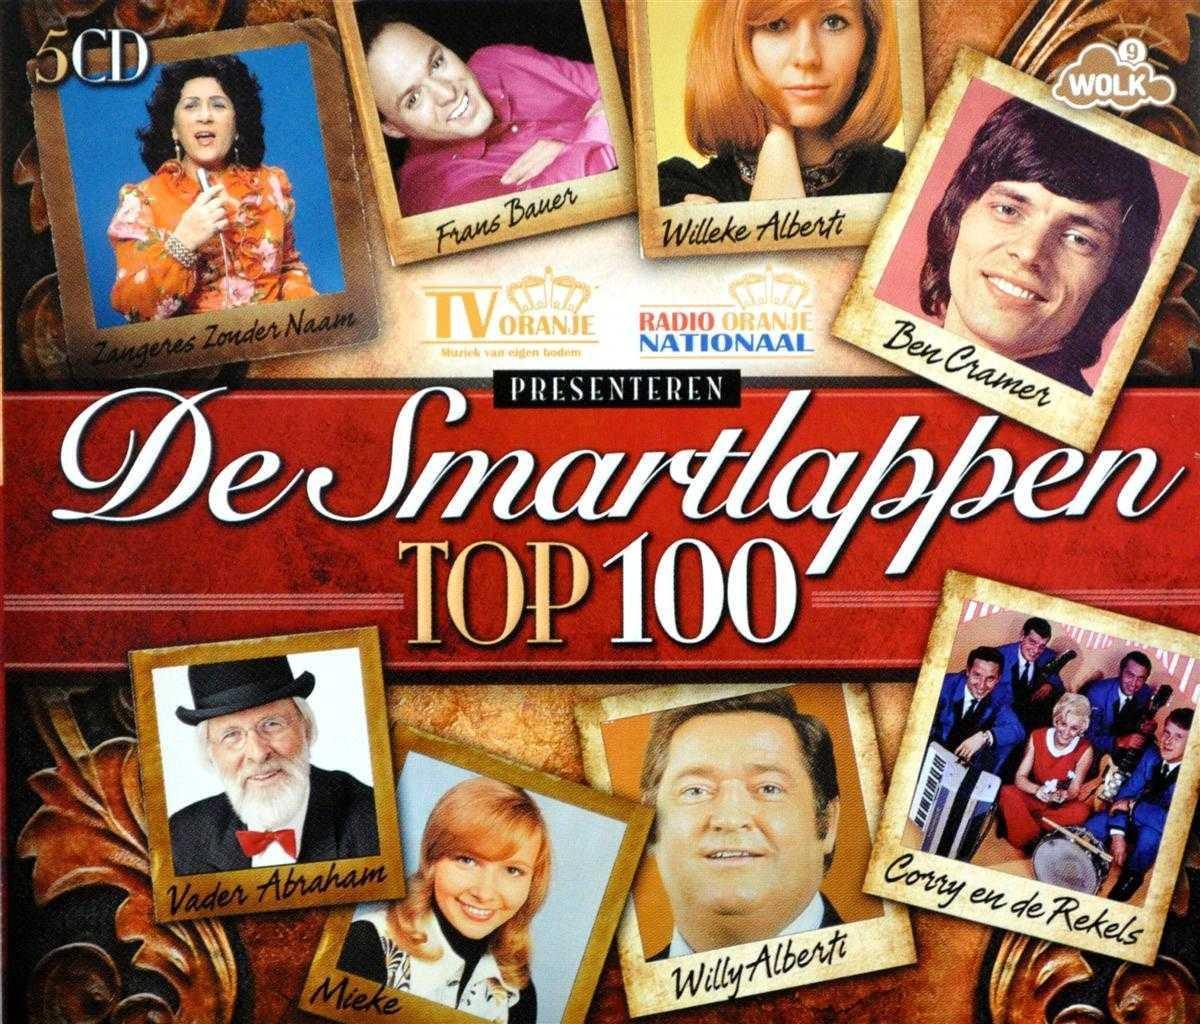 De Smartlappen Top 100 - various artists